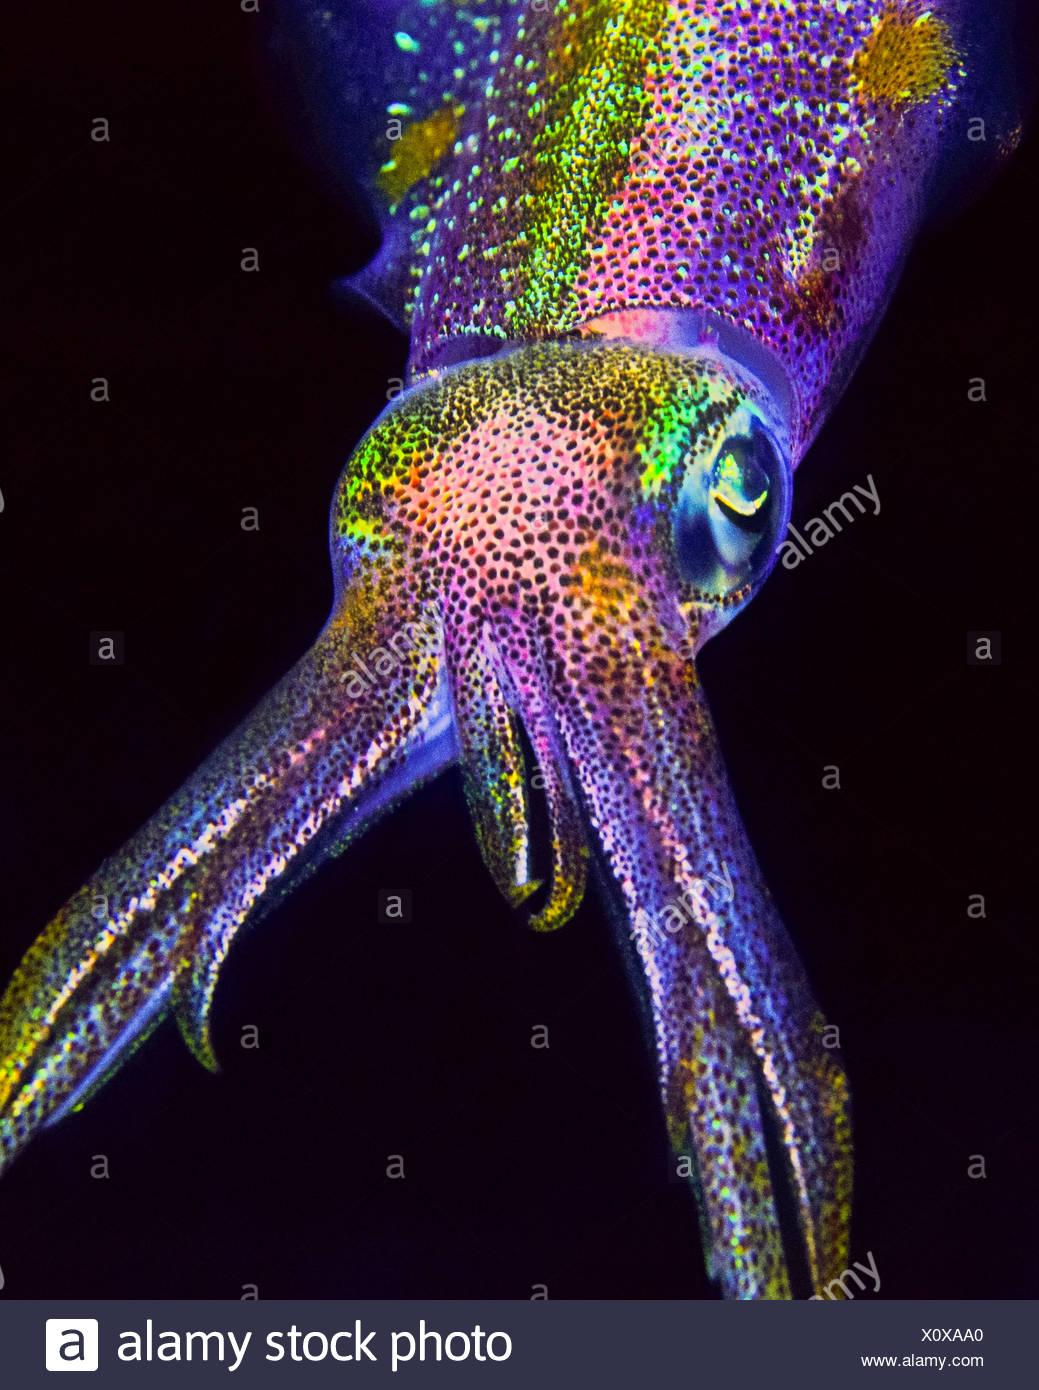 Arrecifes del Caribe, calamar Sepioteuthis sepioidea, Key Largo, Florida, EE.UU. Imagen De Stock